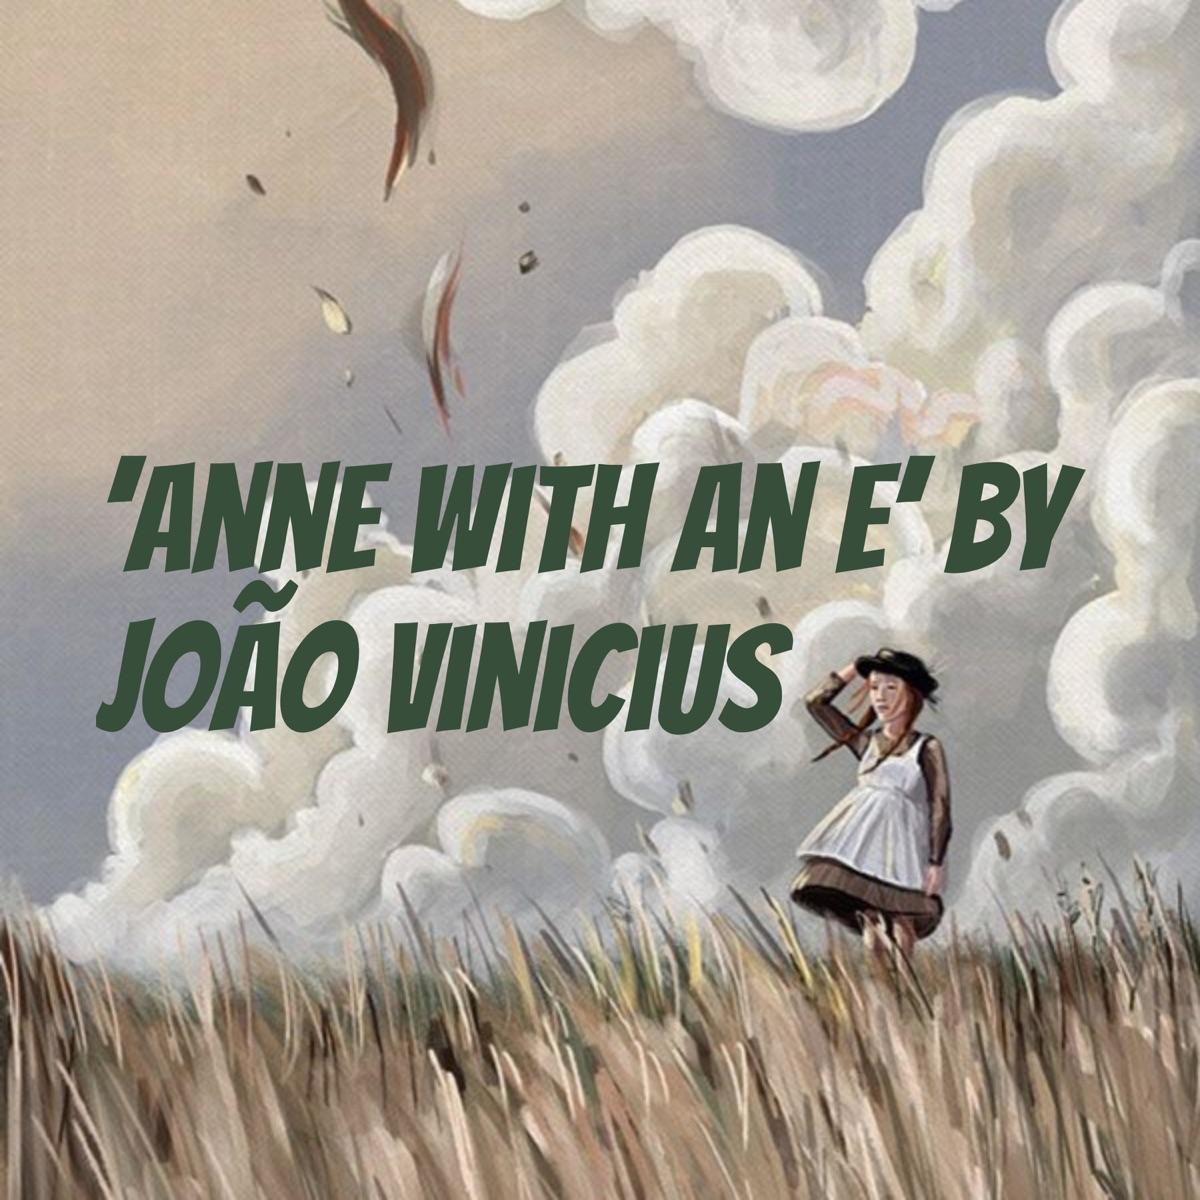 'Anne with an e' by João Vinicius